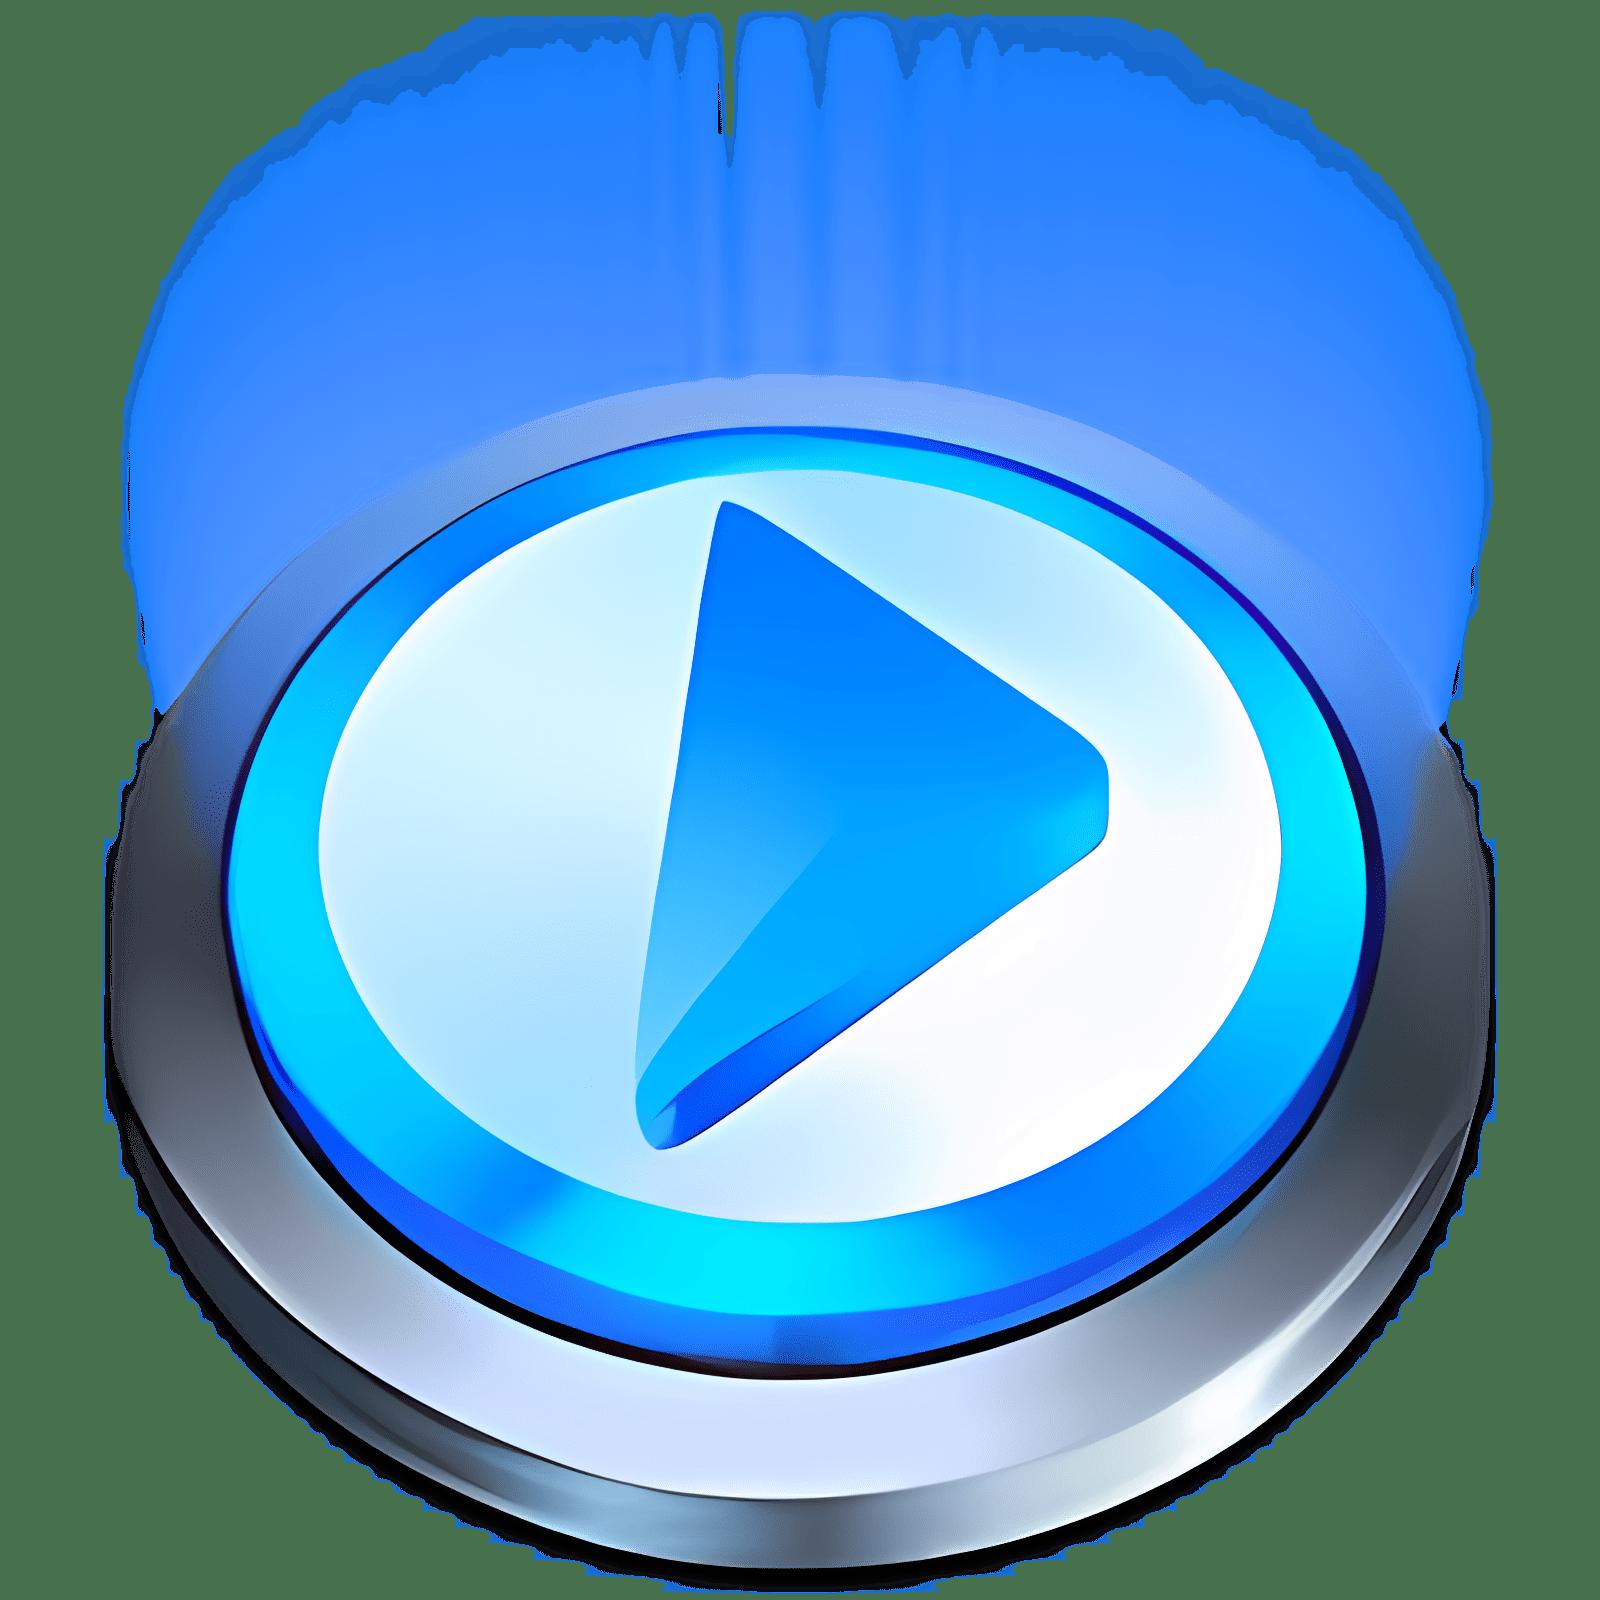 iDeer ブルーレイプレーヤー(Blu-ray Player)